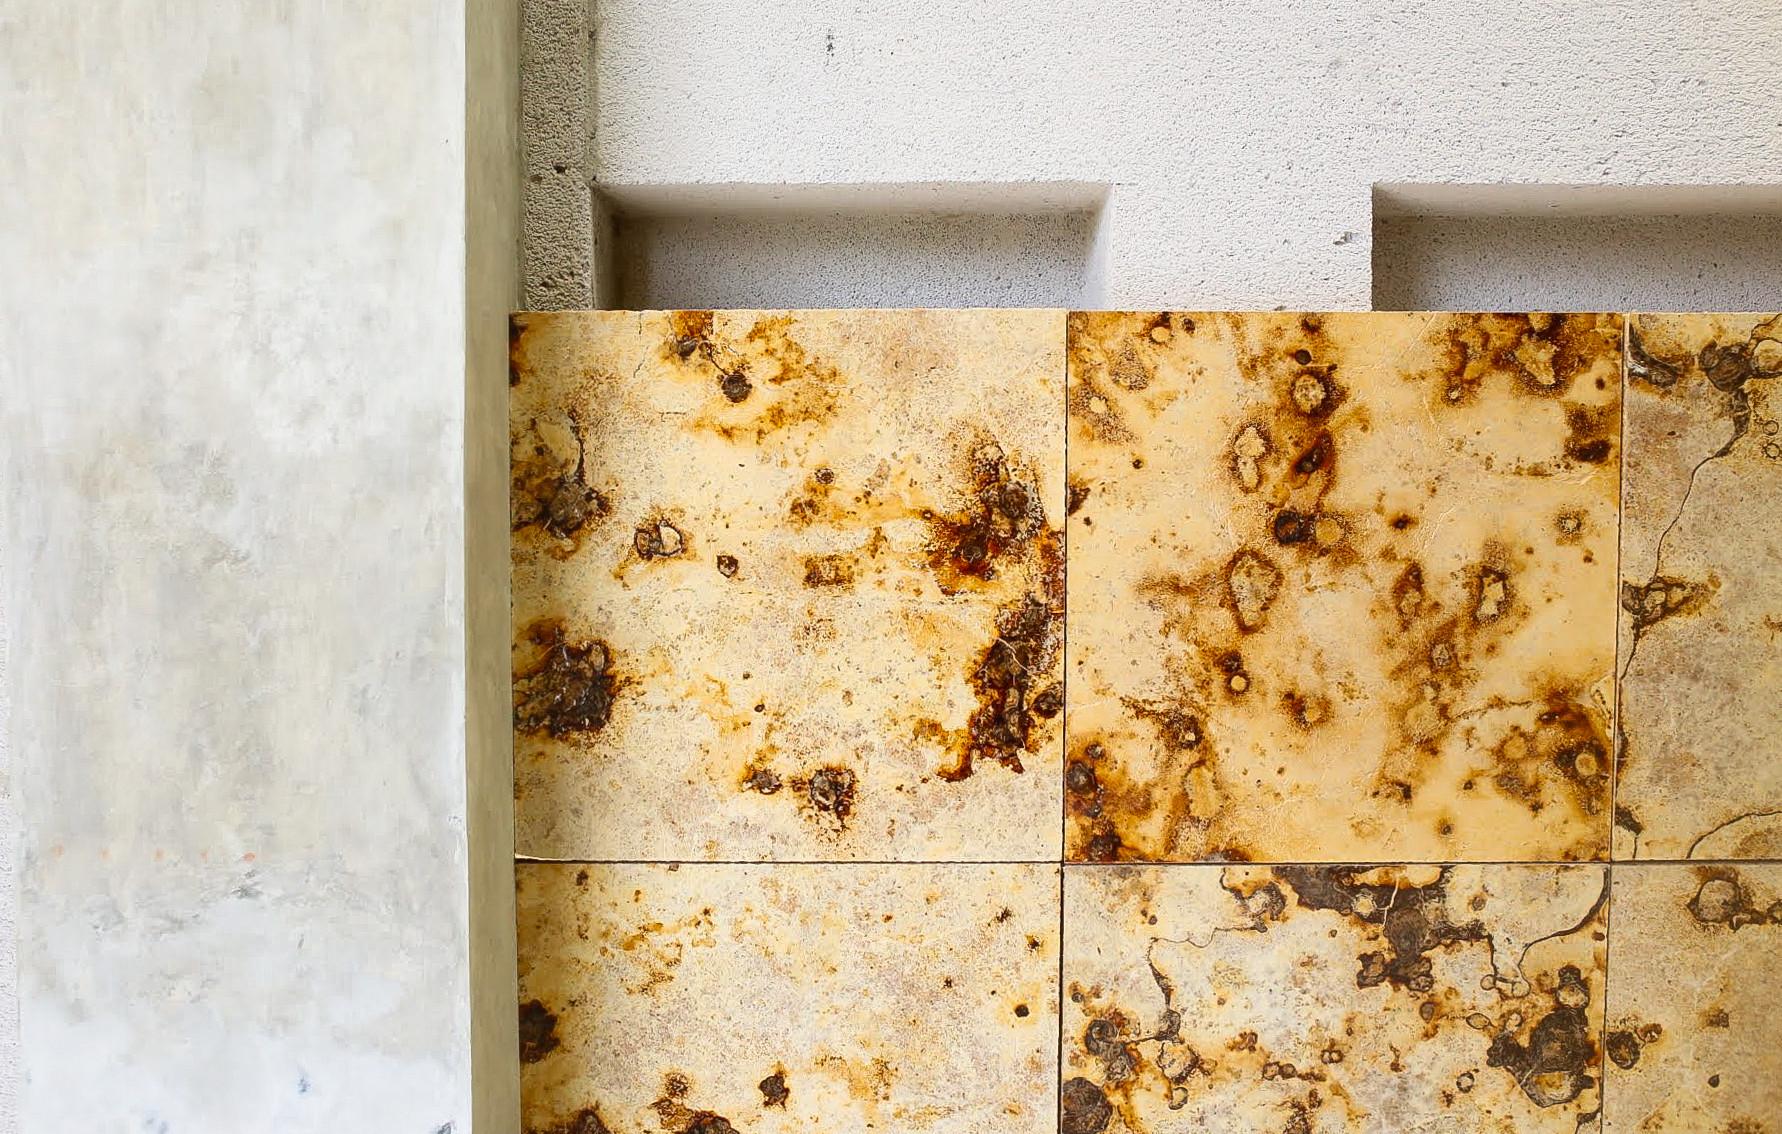 Mycelium | Mycotech